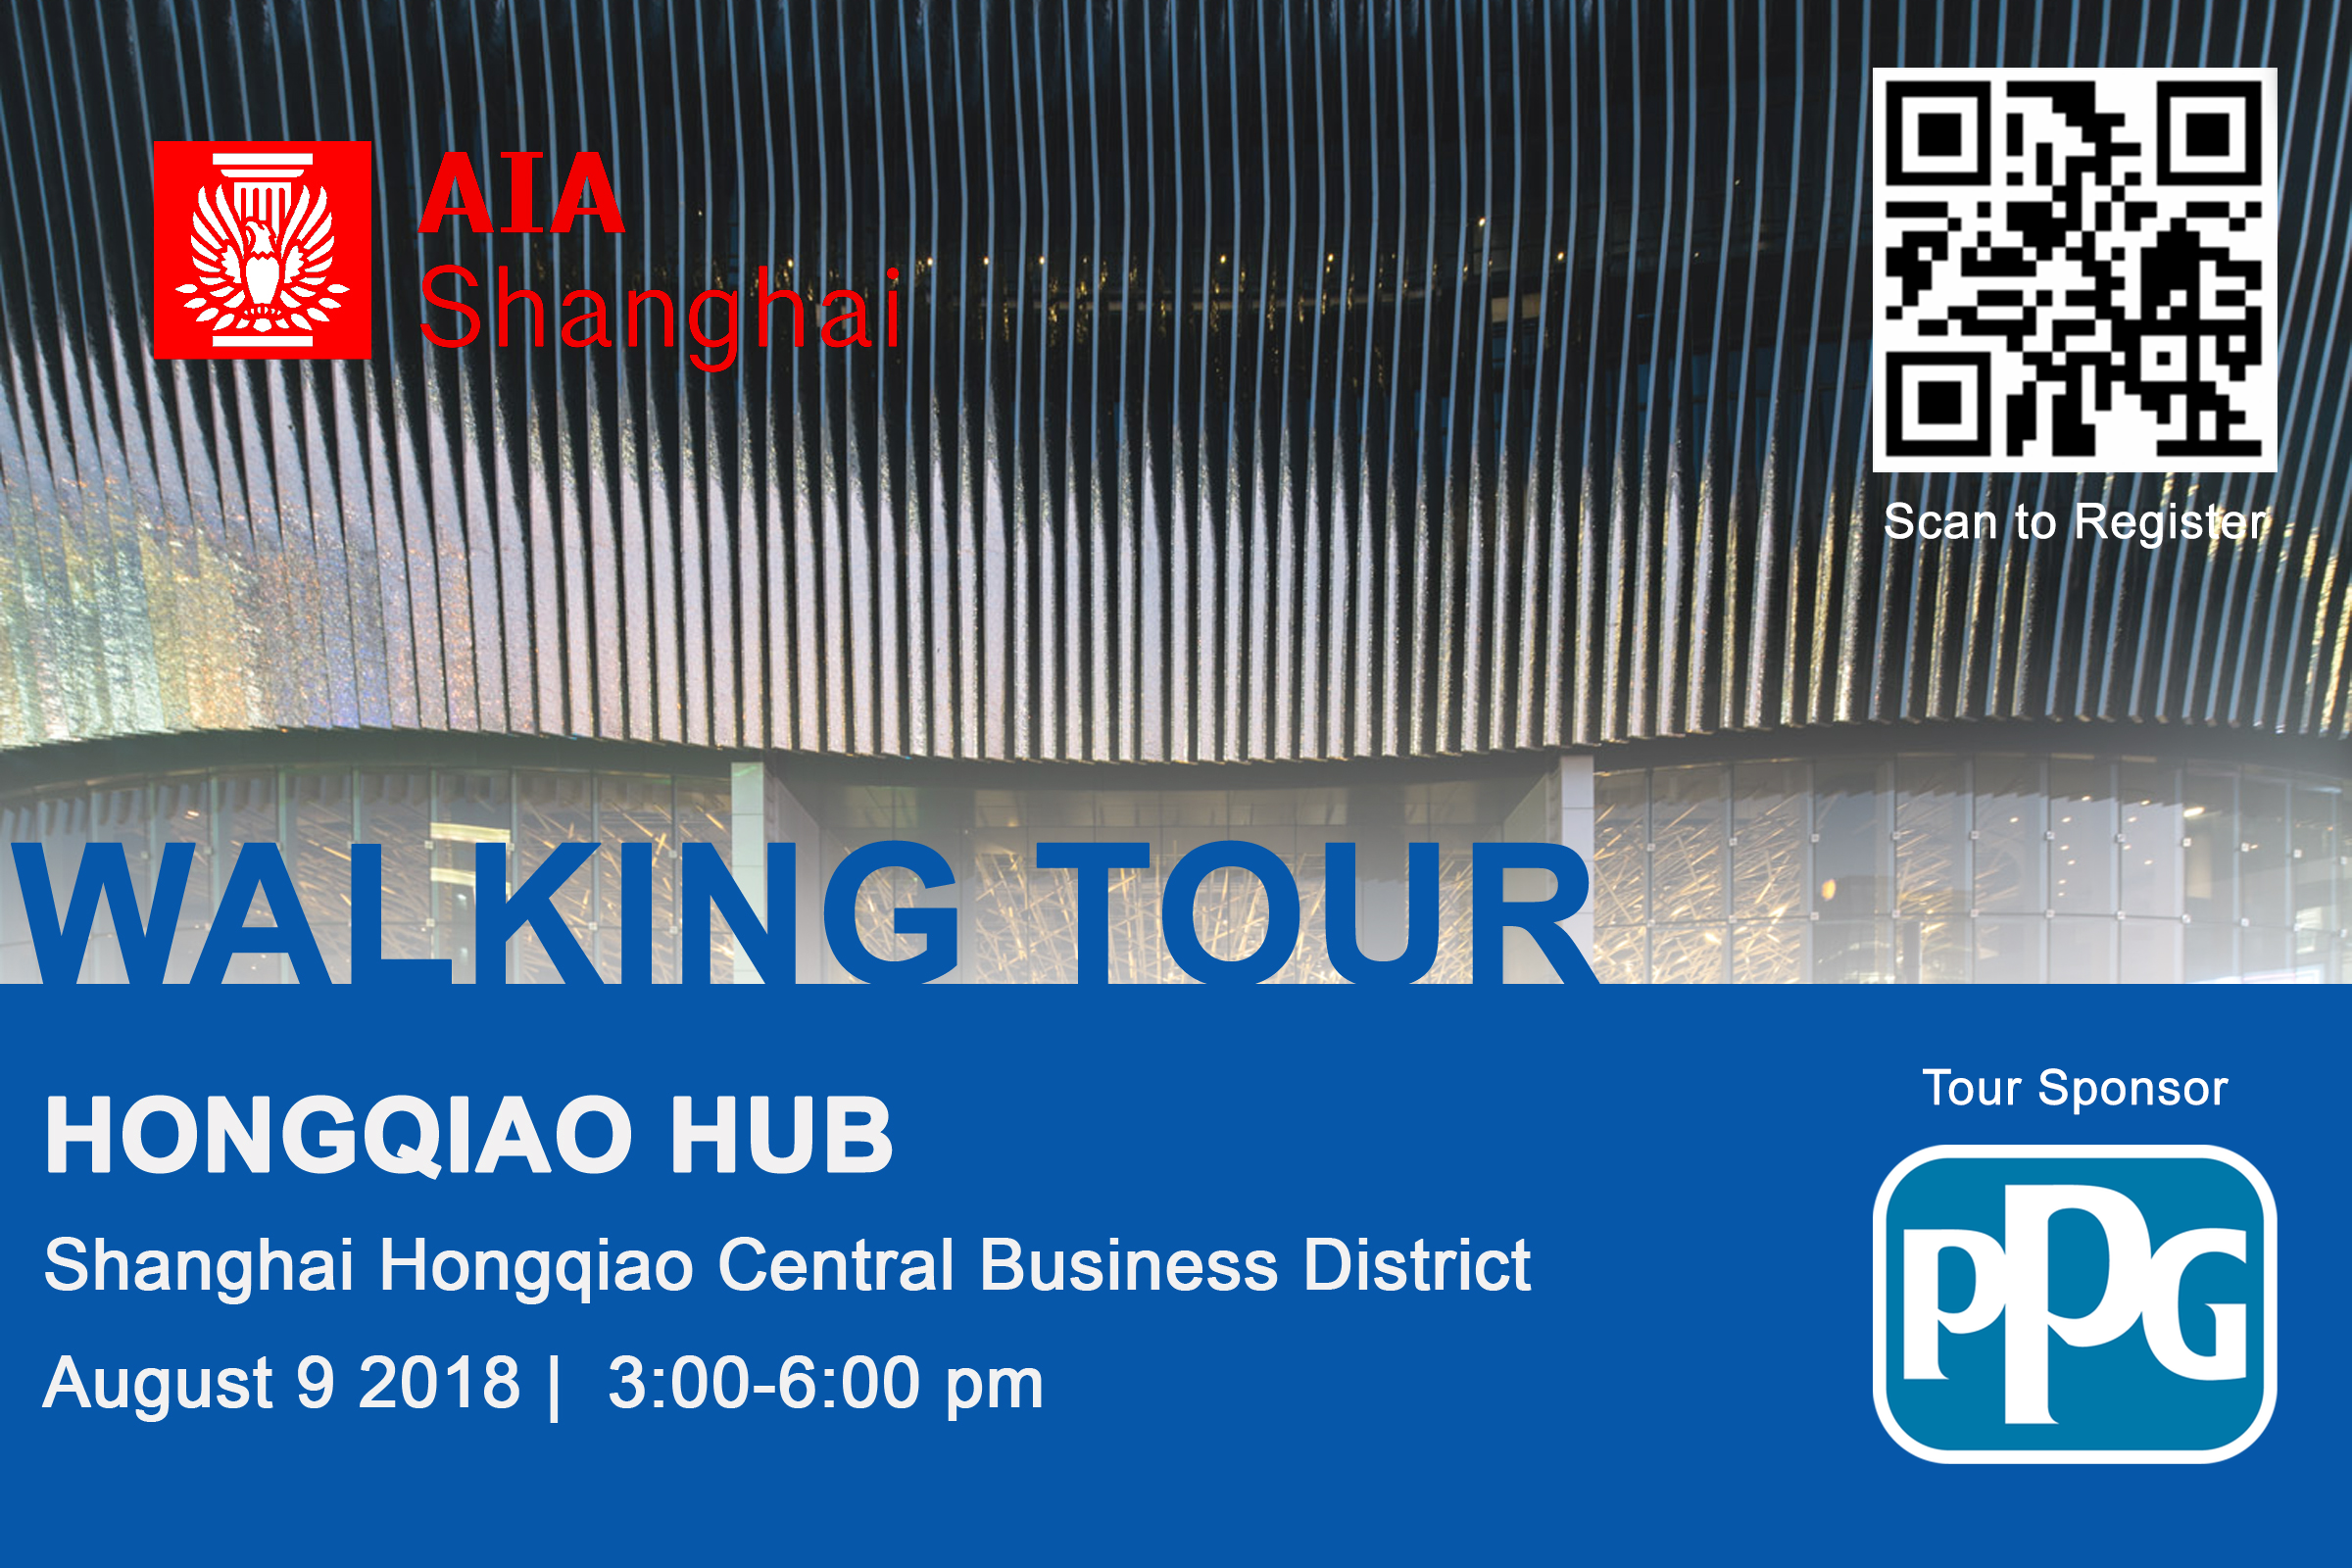 hongqiaohub_tour_sponsor.png